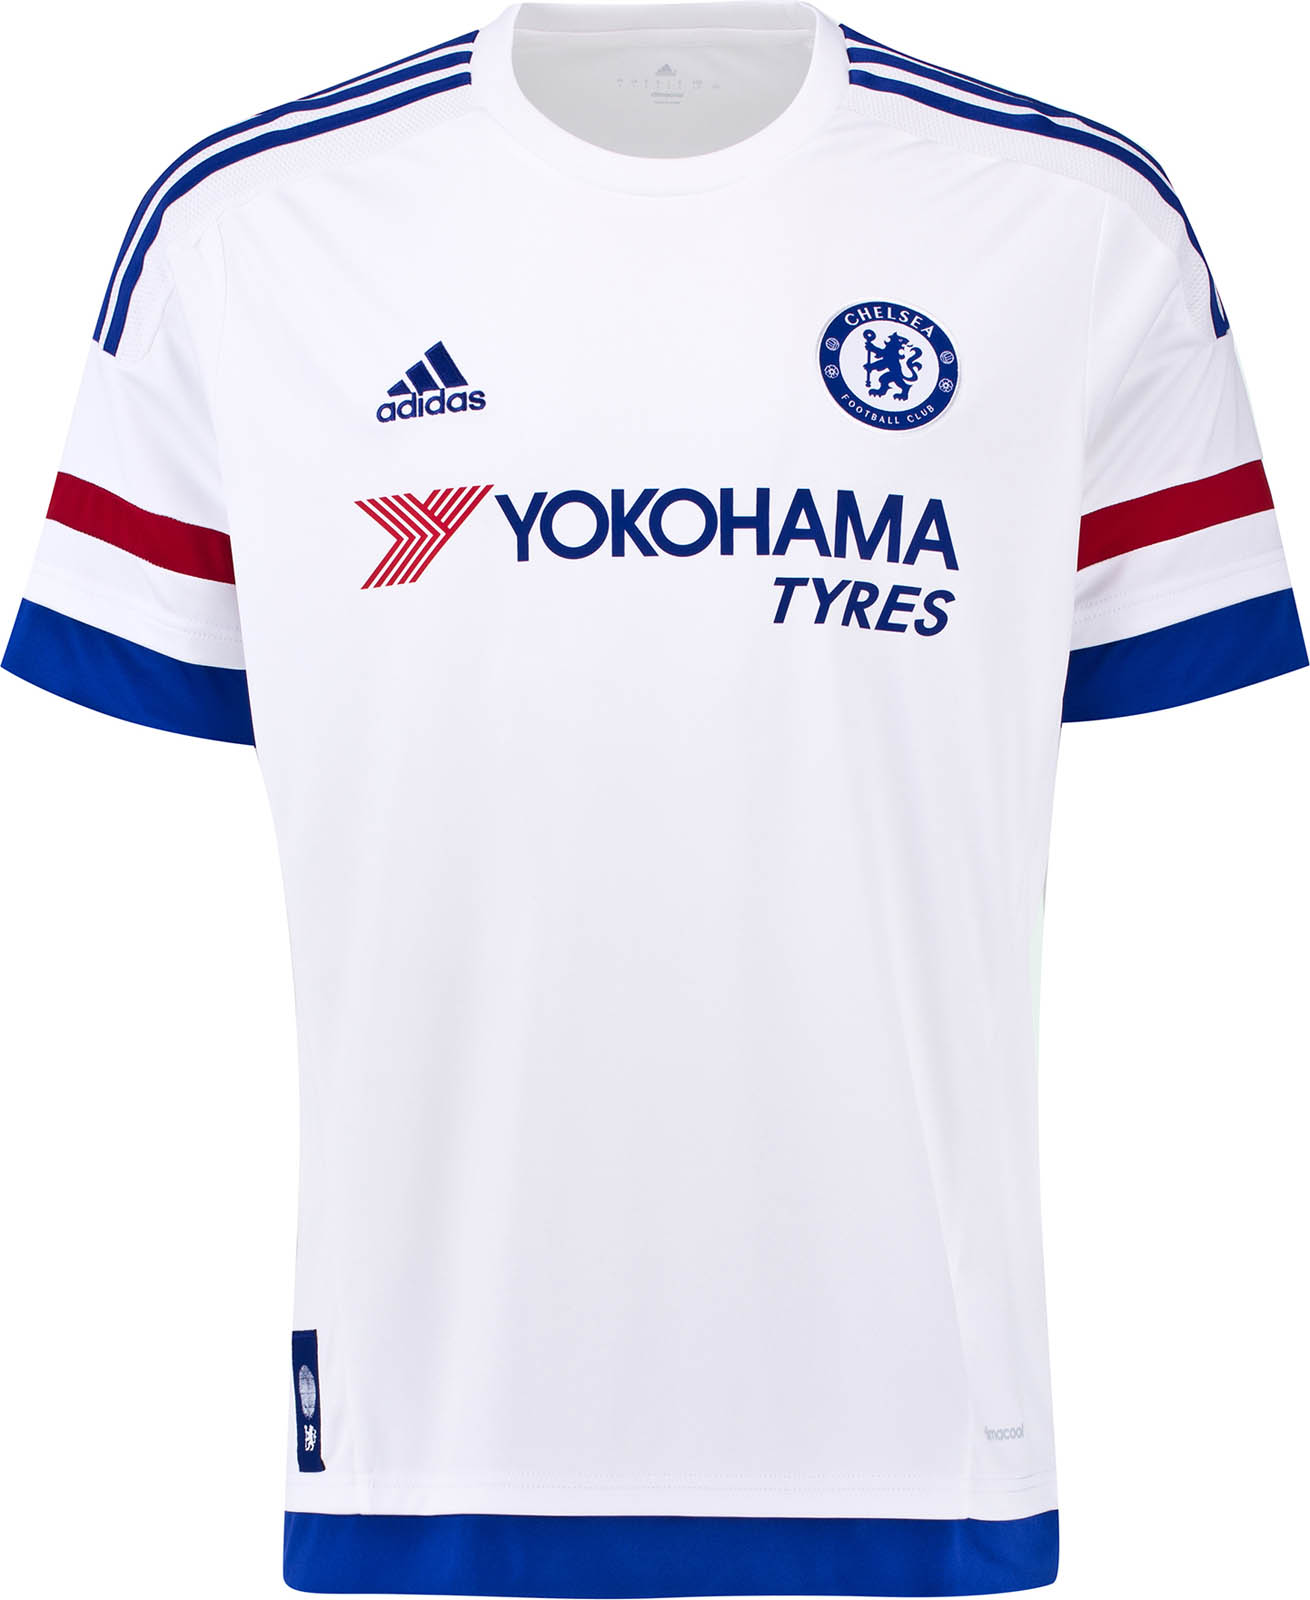 028d25d08b2 The new white Adidas Chelsea 15-16 Away Kit has a modern kit design with a  simple white crew neck collar. The Yokohama sponsor logo on the Chelsea 2015 -2016 ...